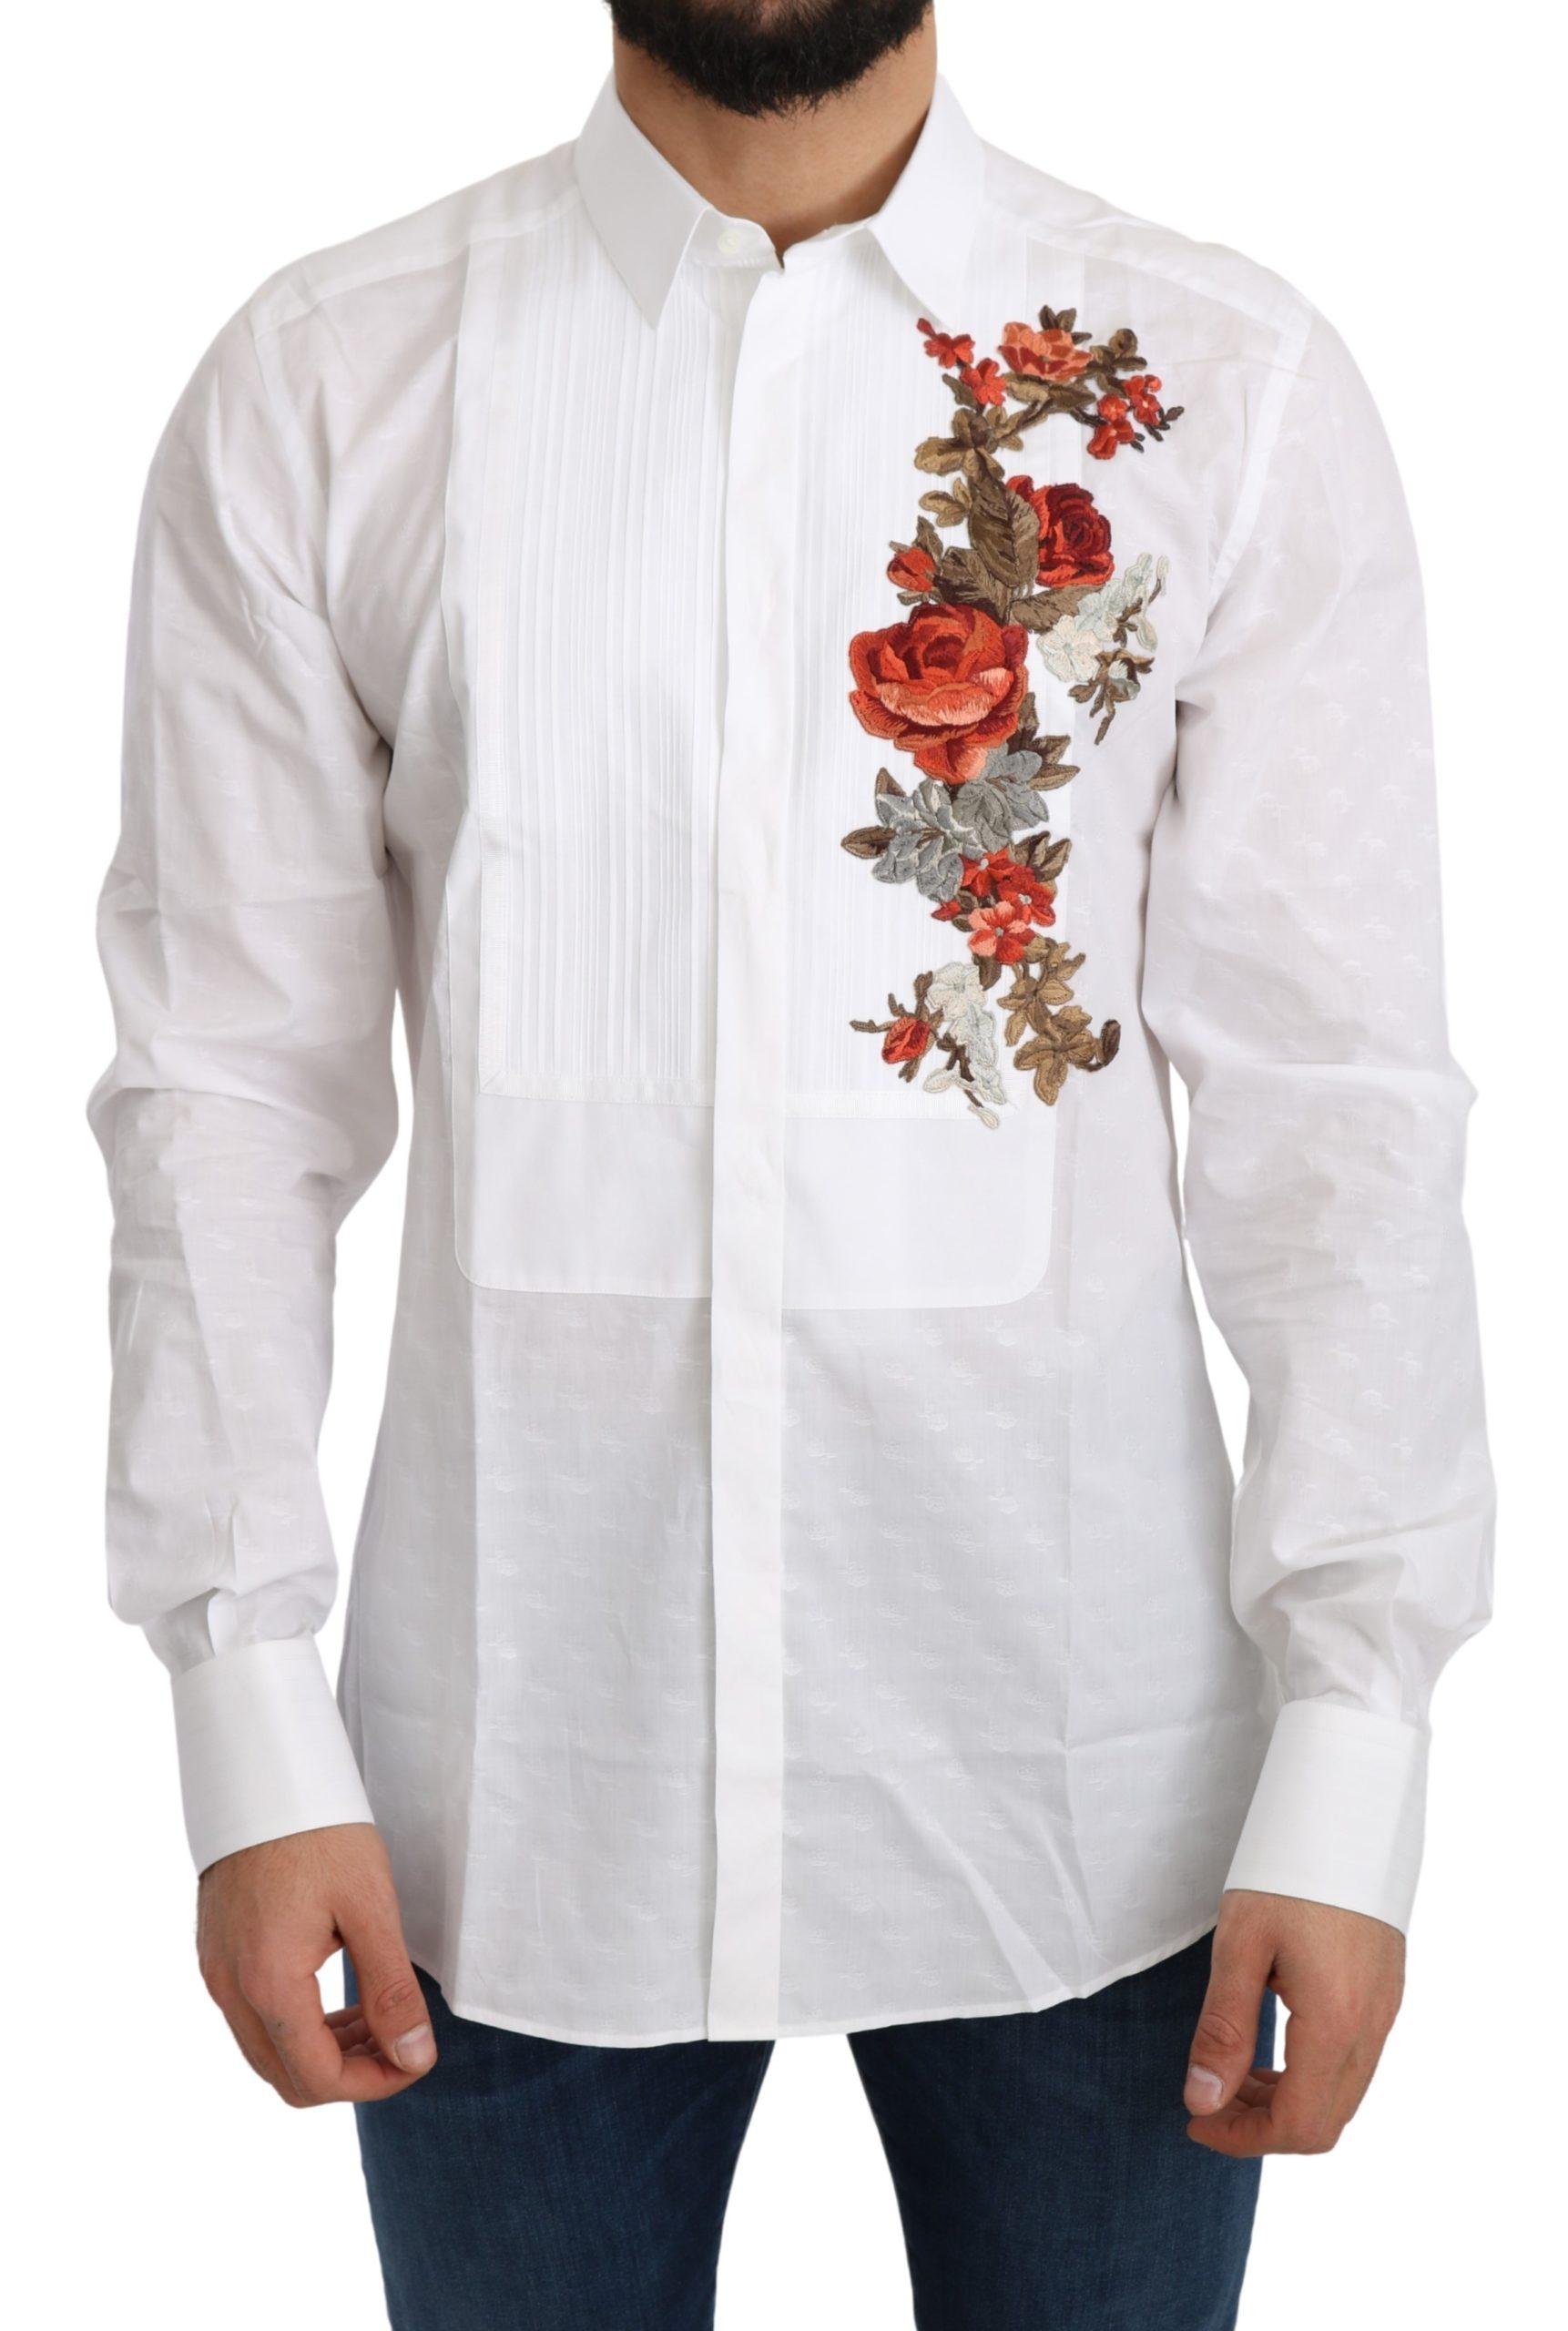 Dolce & Gabbana Men's Cotton GOLD Flowers Top Solid Shirt White TSH5217 - IT38 | XS